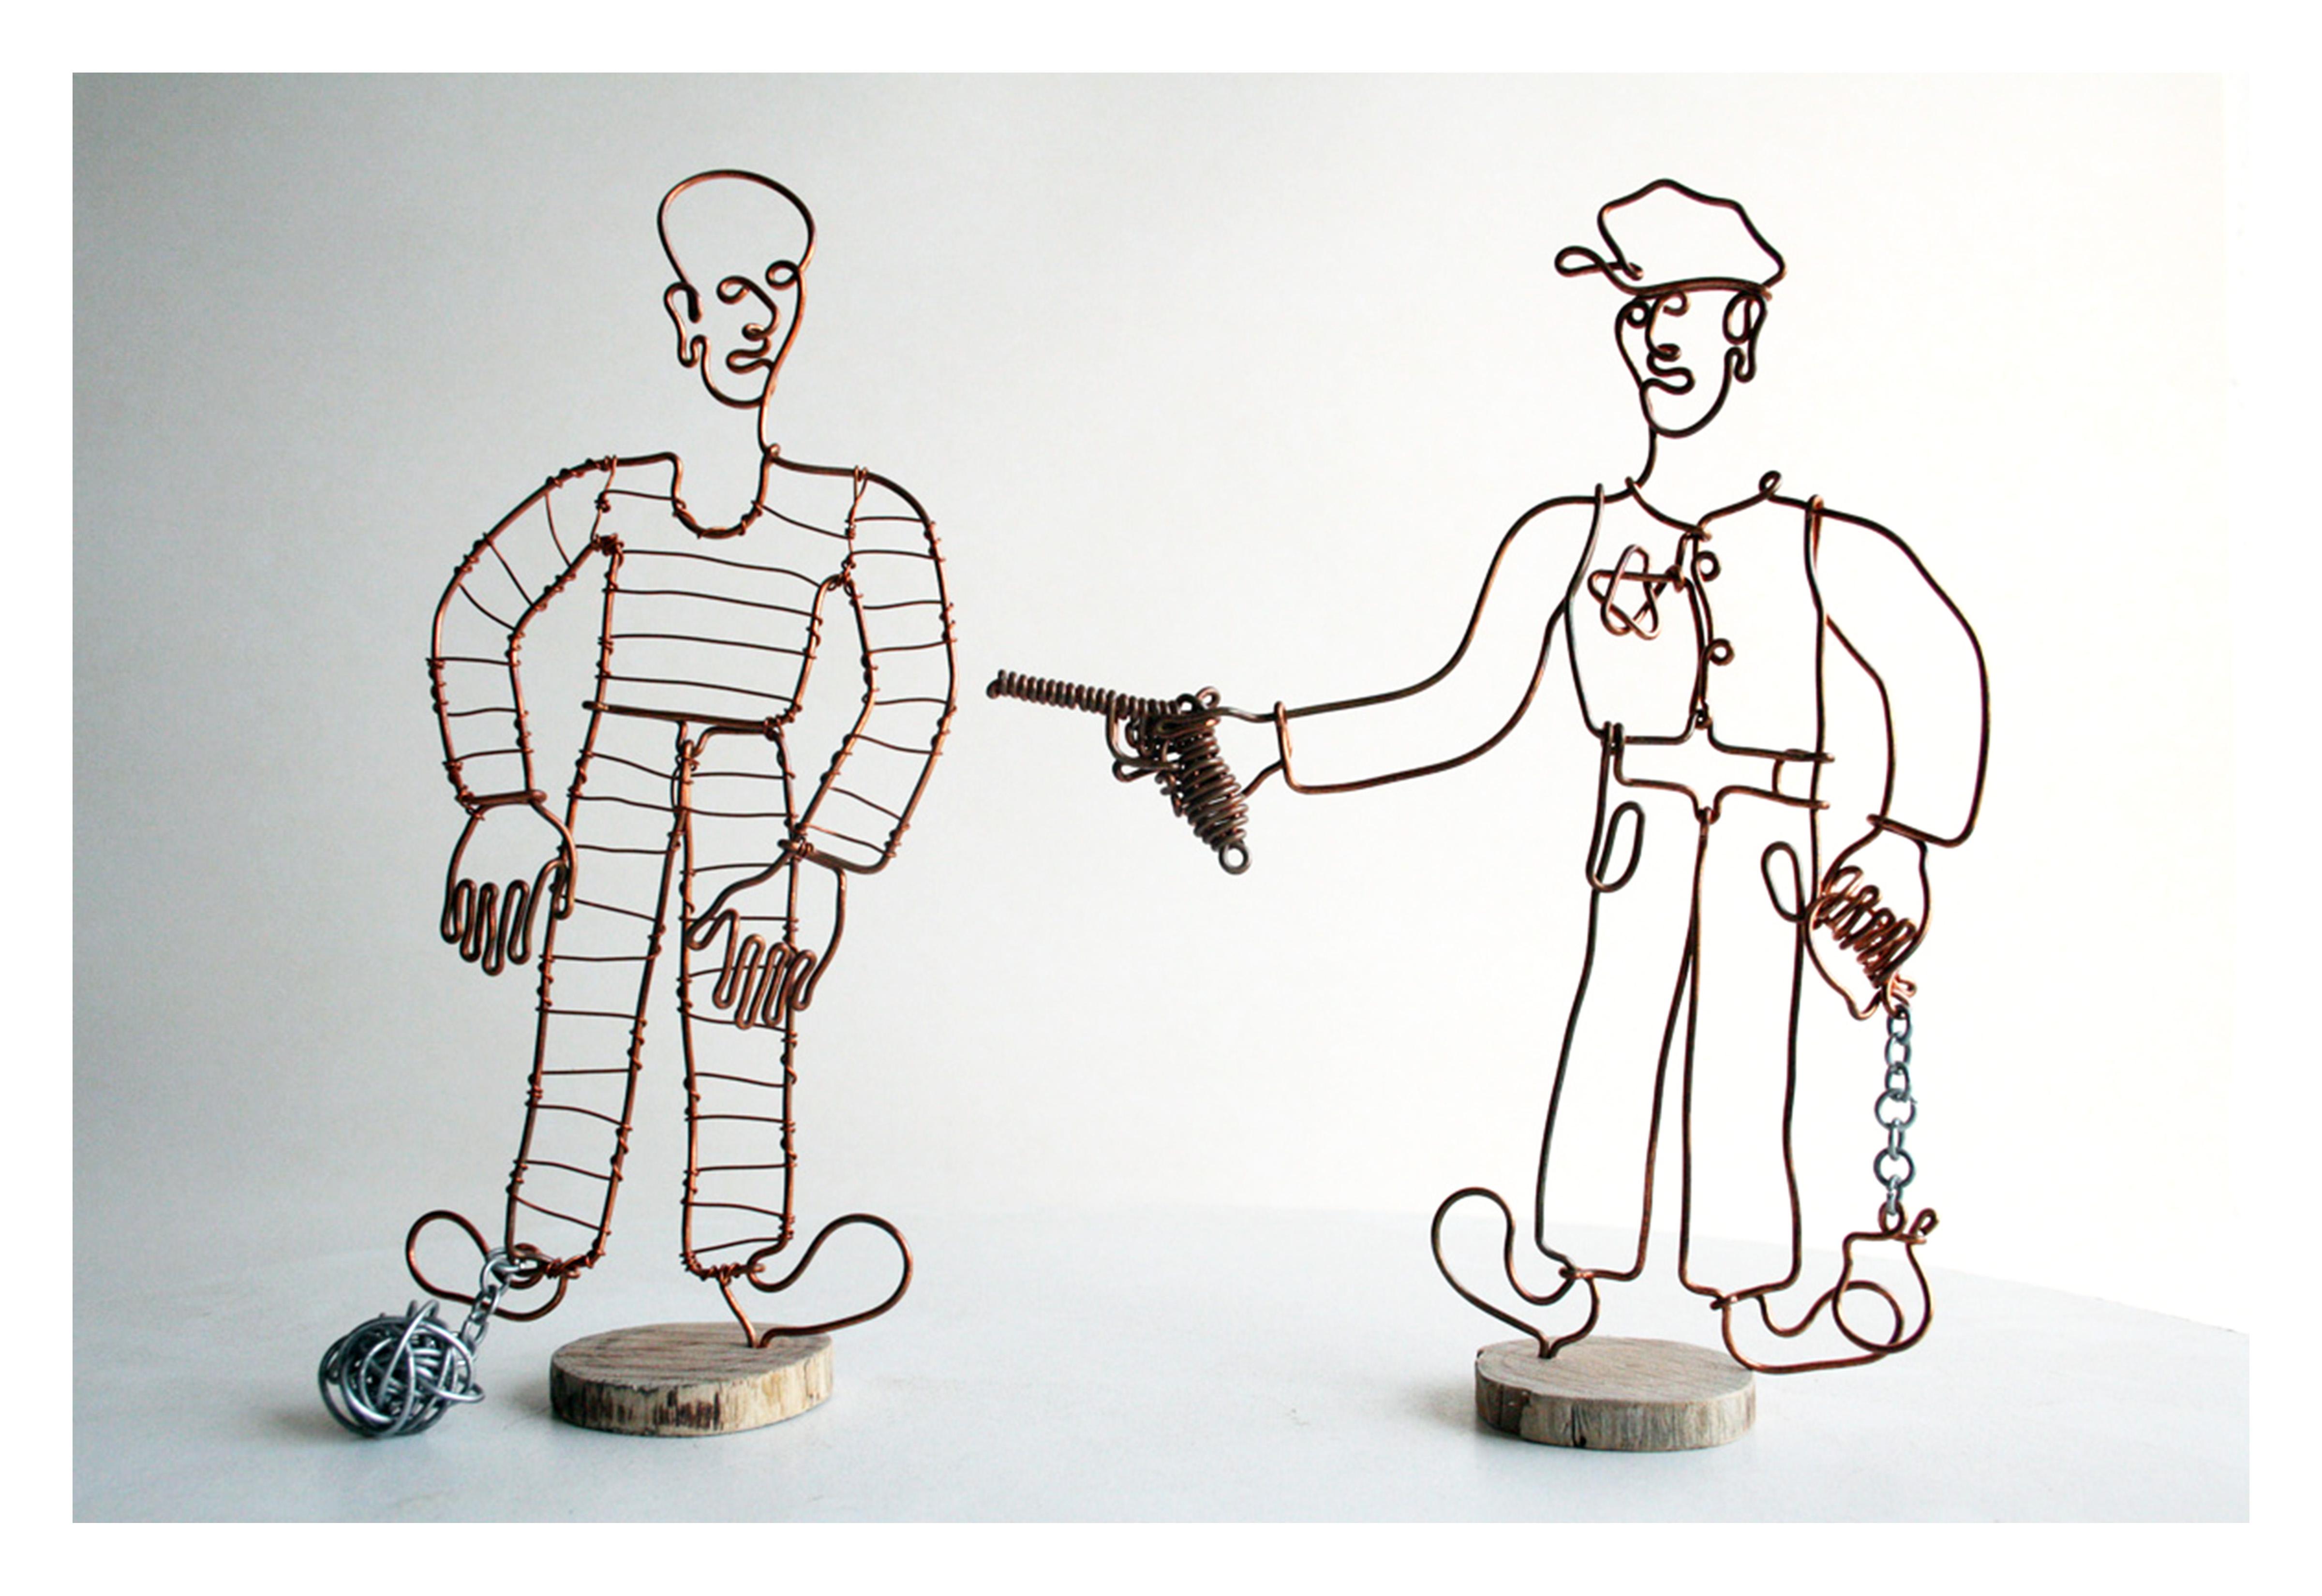 Police and prisoner